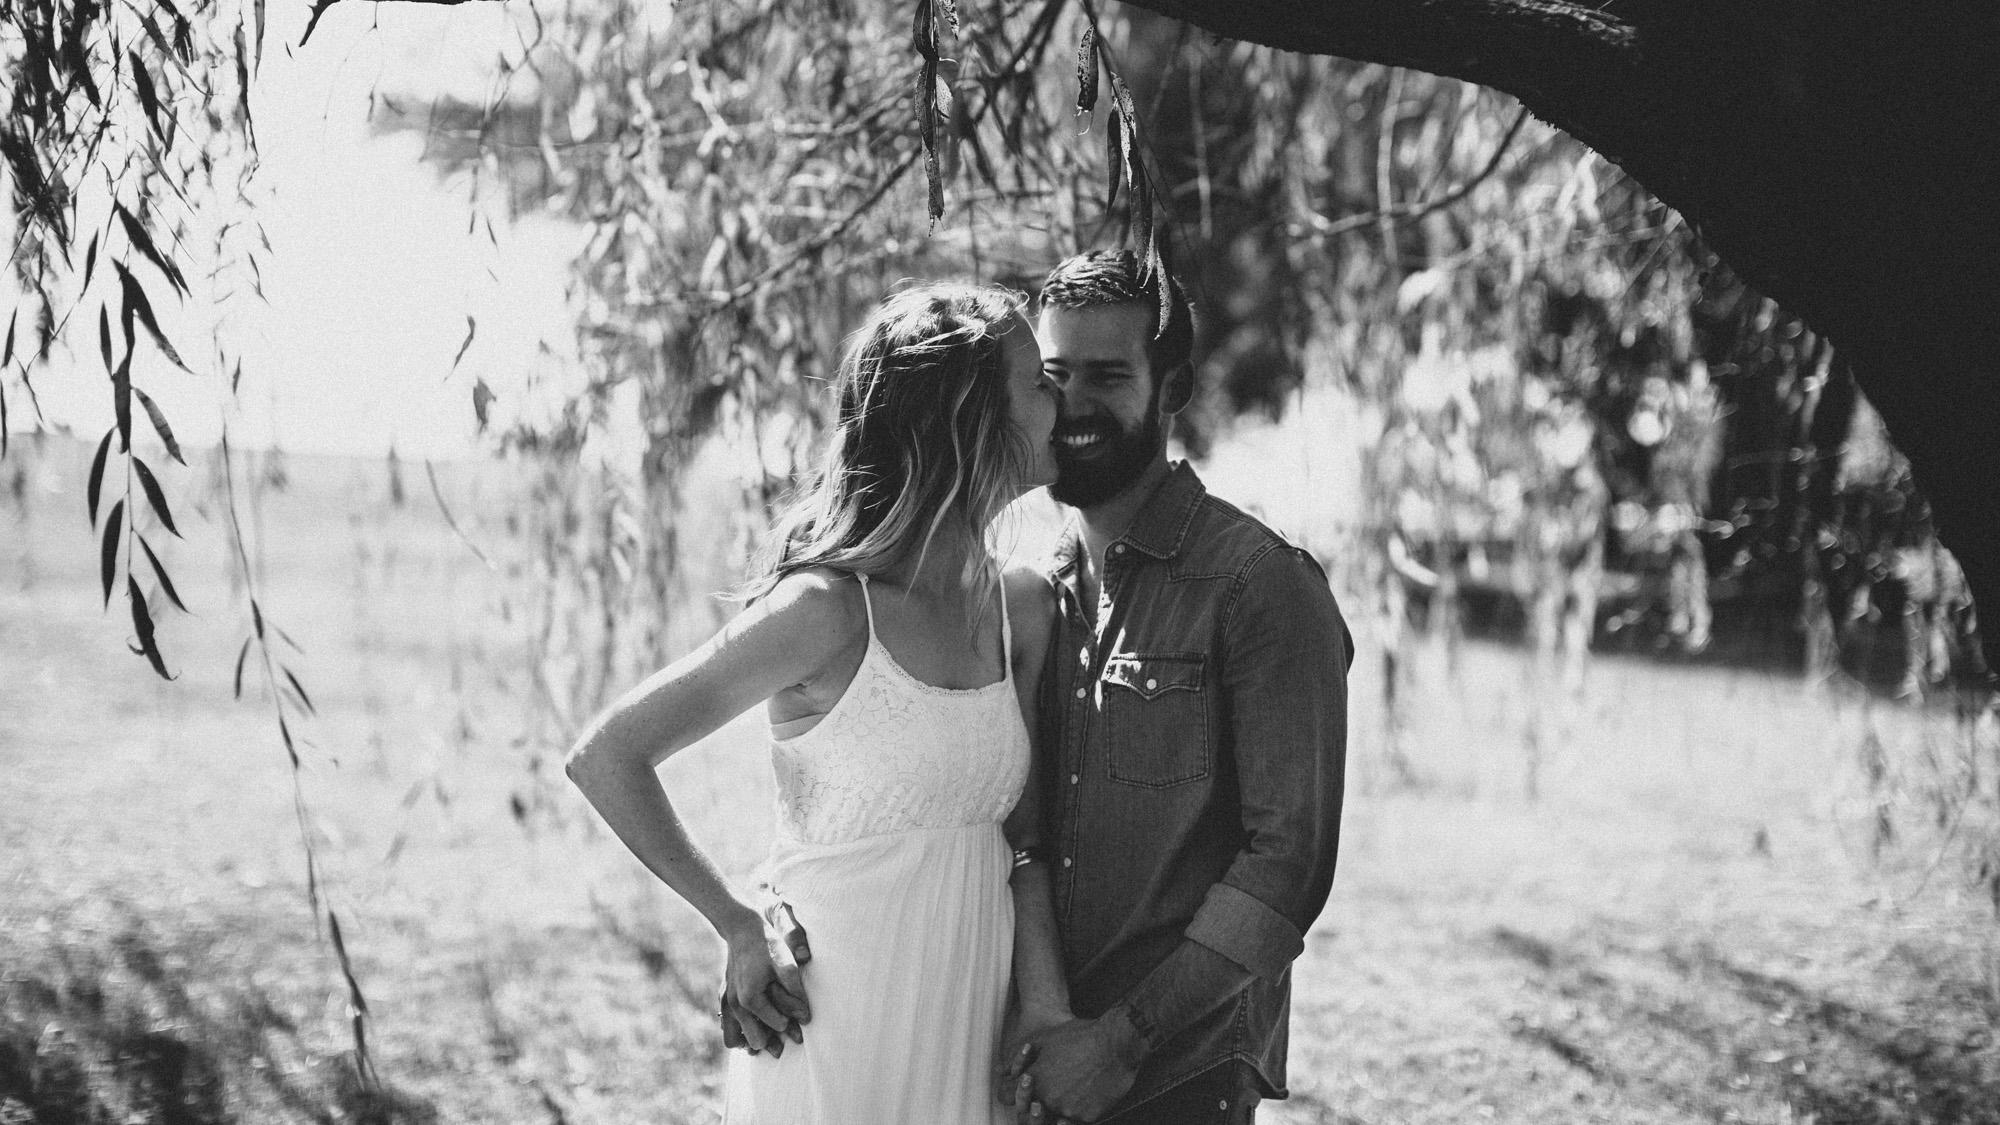 alec_vanderboom_springfield_missouri_wedding-0018.jpg